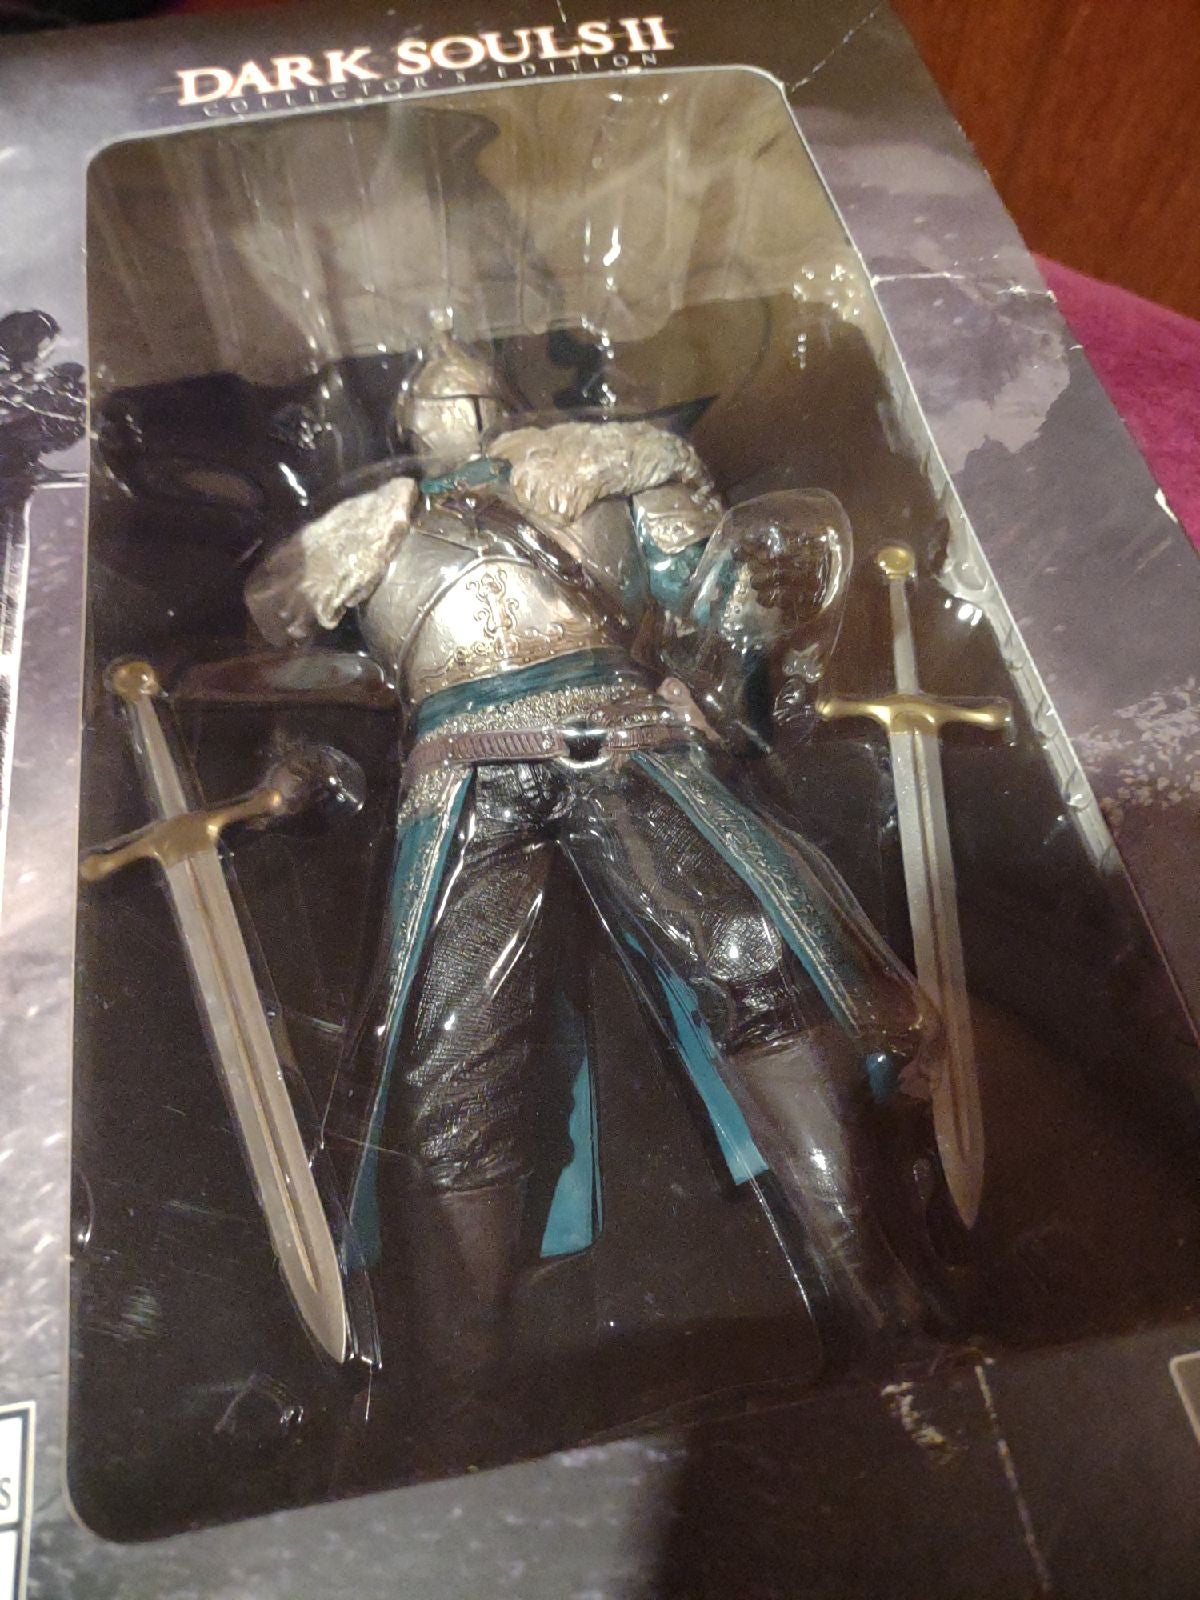 Dark souls 2 statue in box